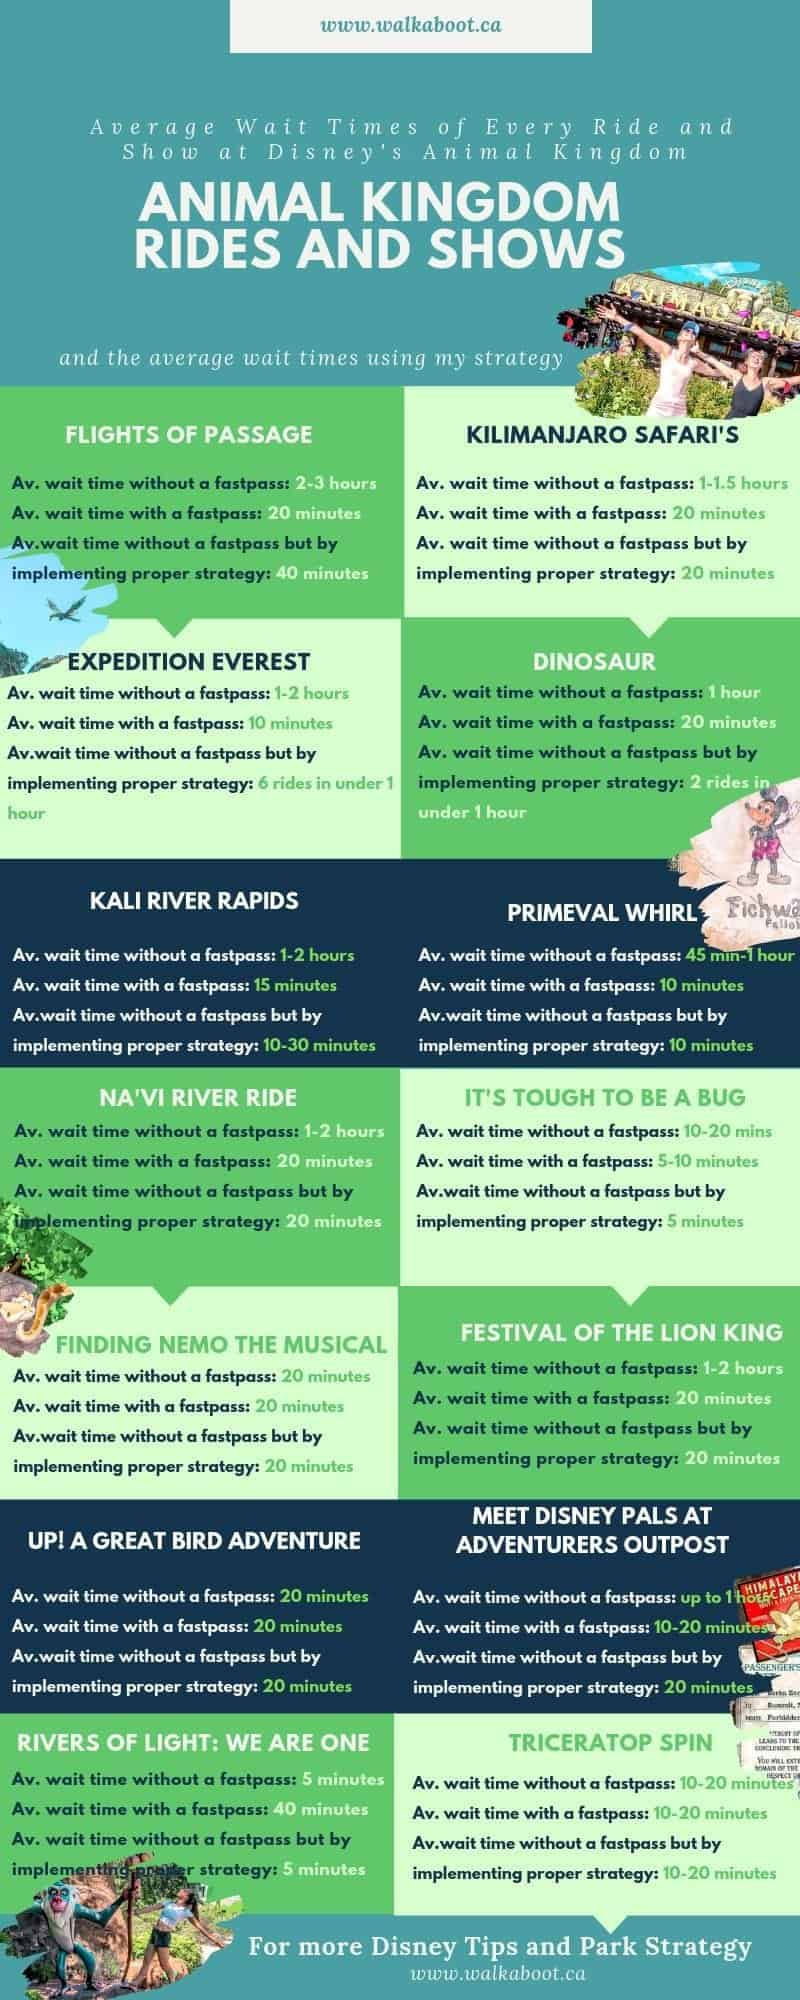 Animal Kingdom rides and wait times list at Walt Disney World